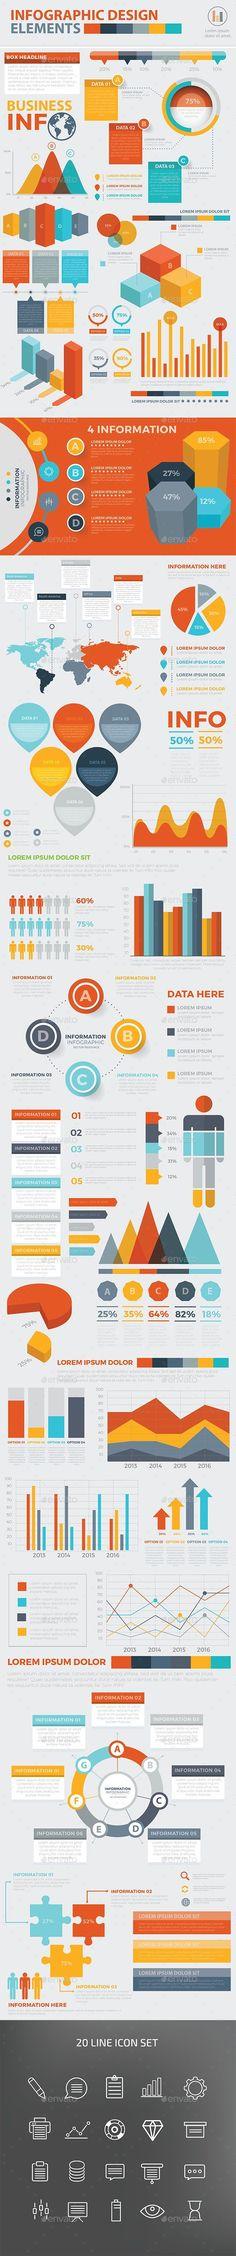 Business infographic : Business infographic : Modern Infographic Elements Design Template Vector EPS AI